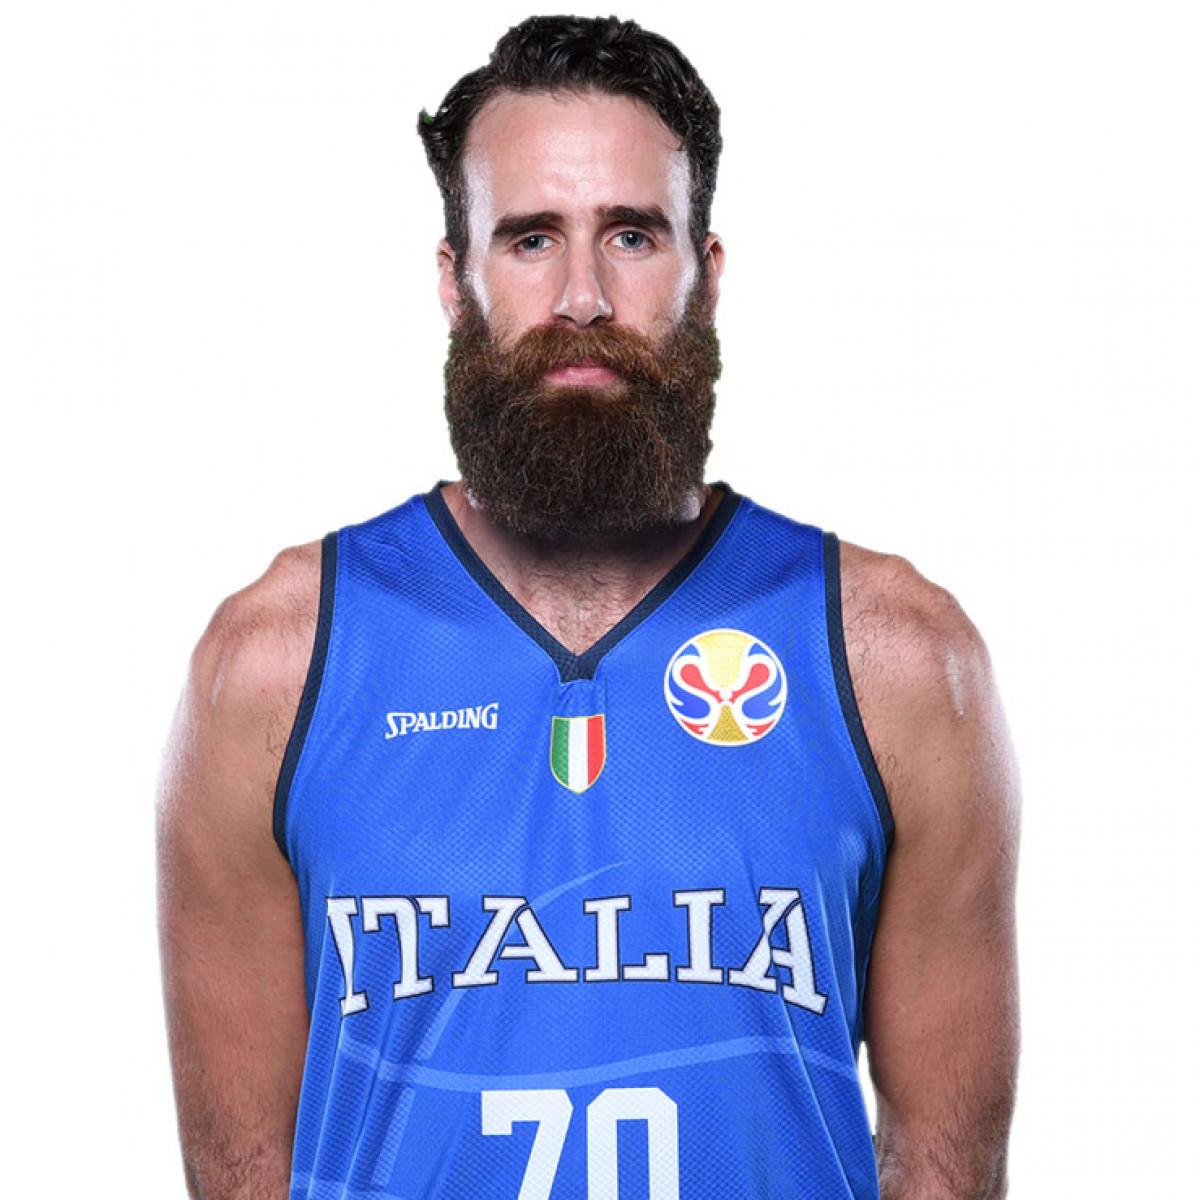 Photo of Luigi Datome, 2019-2020 season